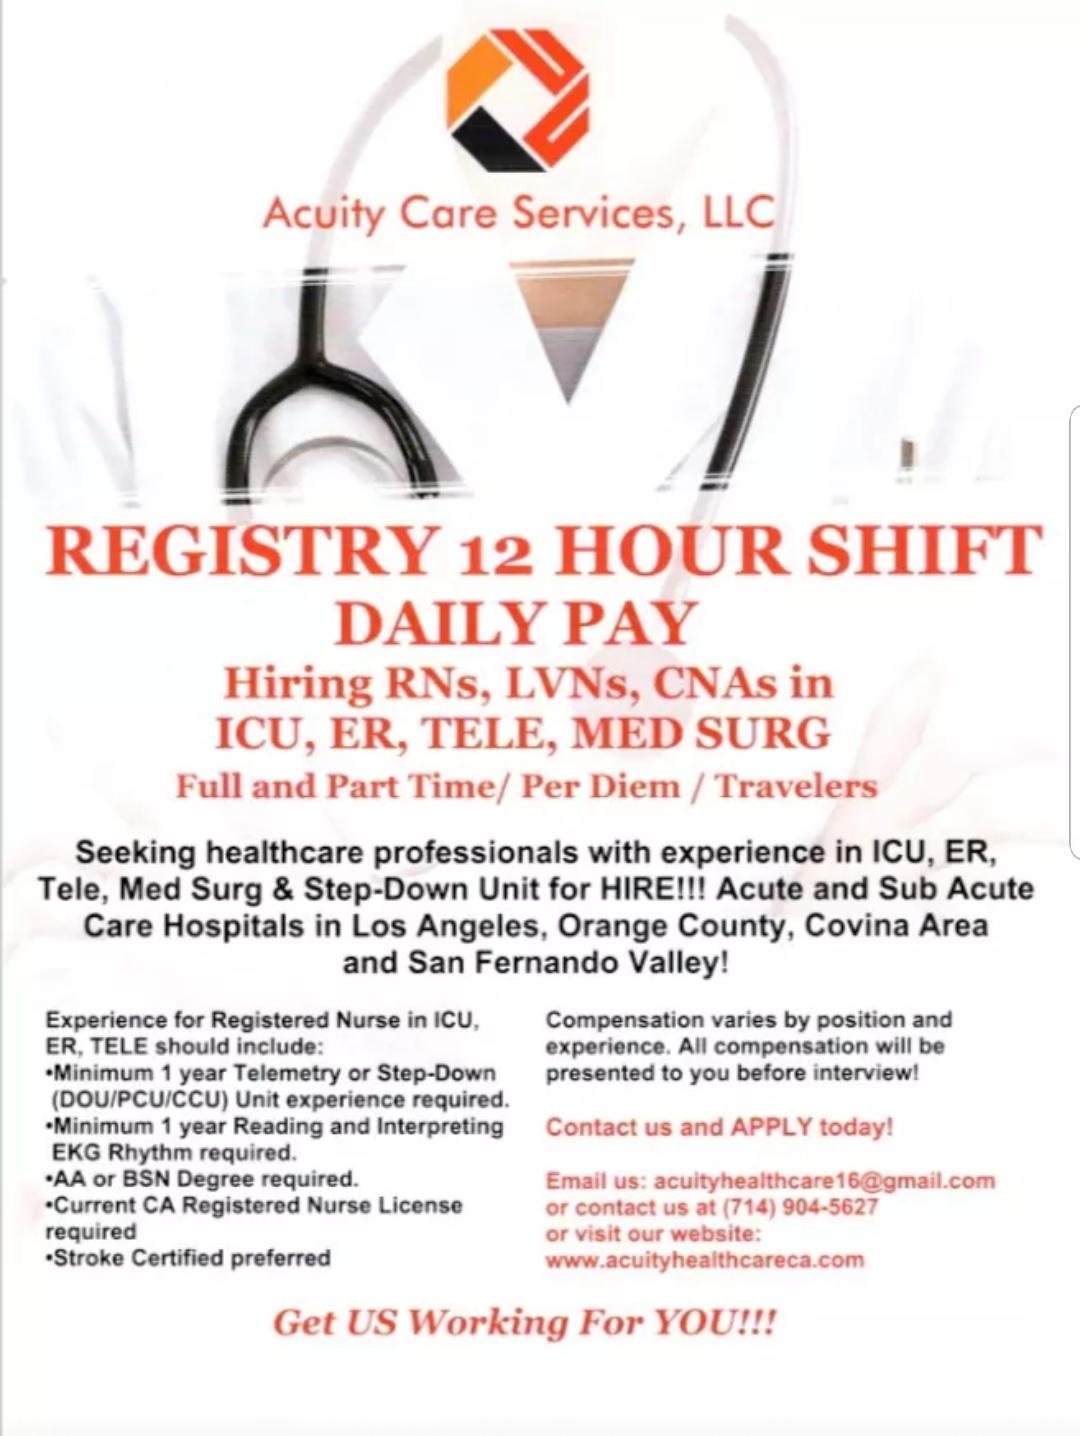 Acuity Care Services LLC Job